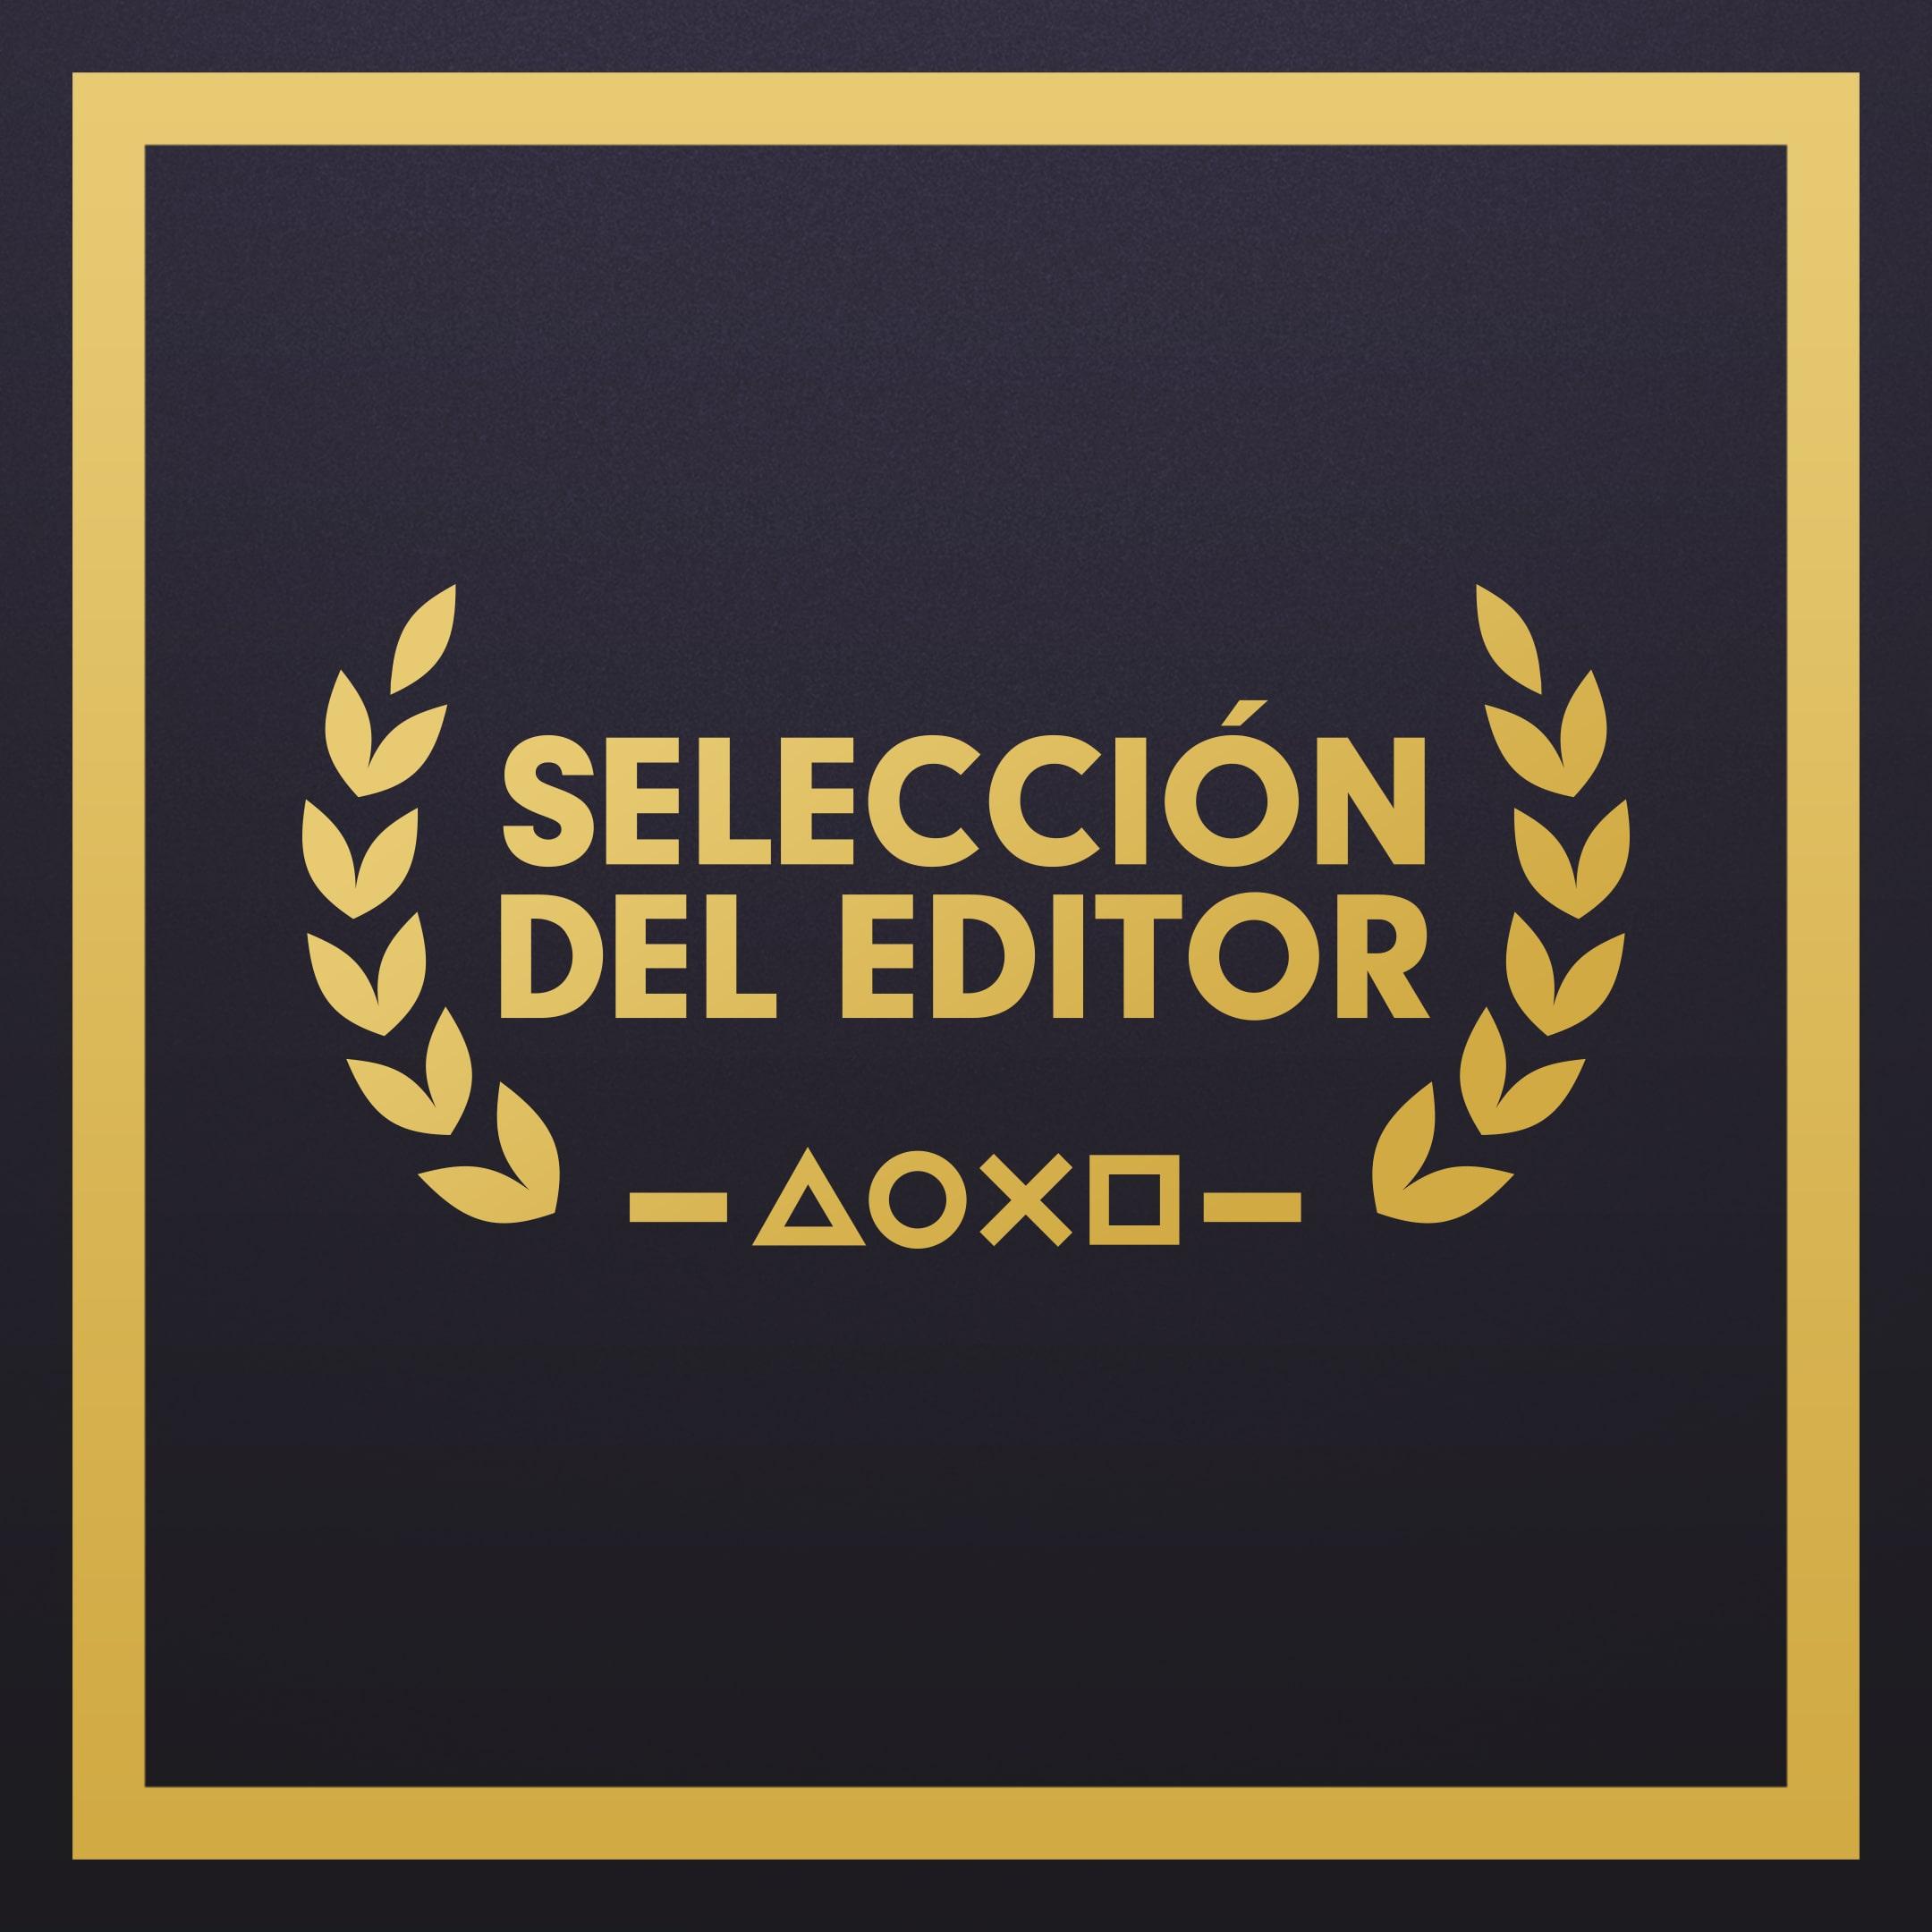 [EDITORIAL] Editors' Choice Web S26